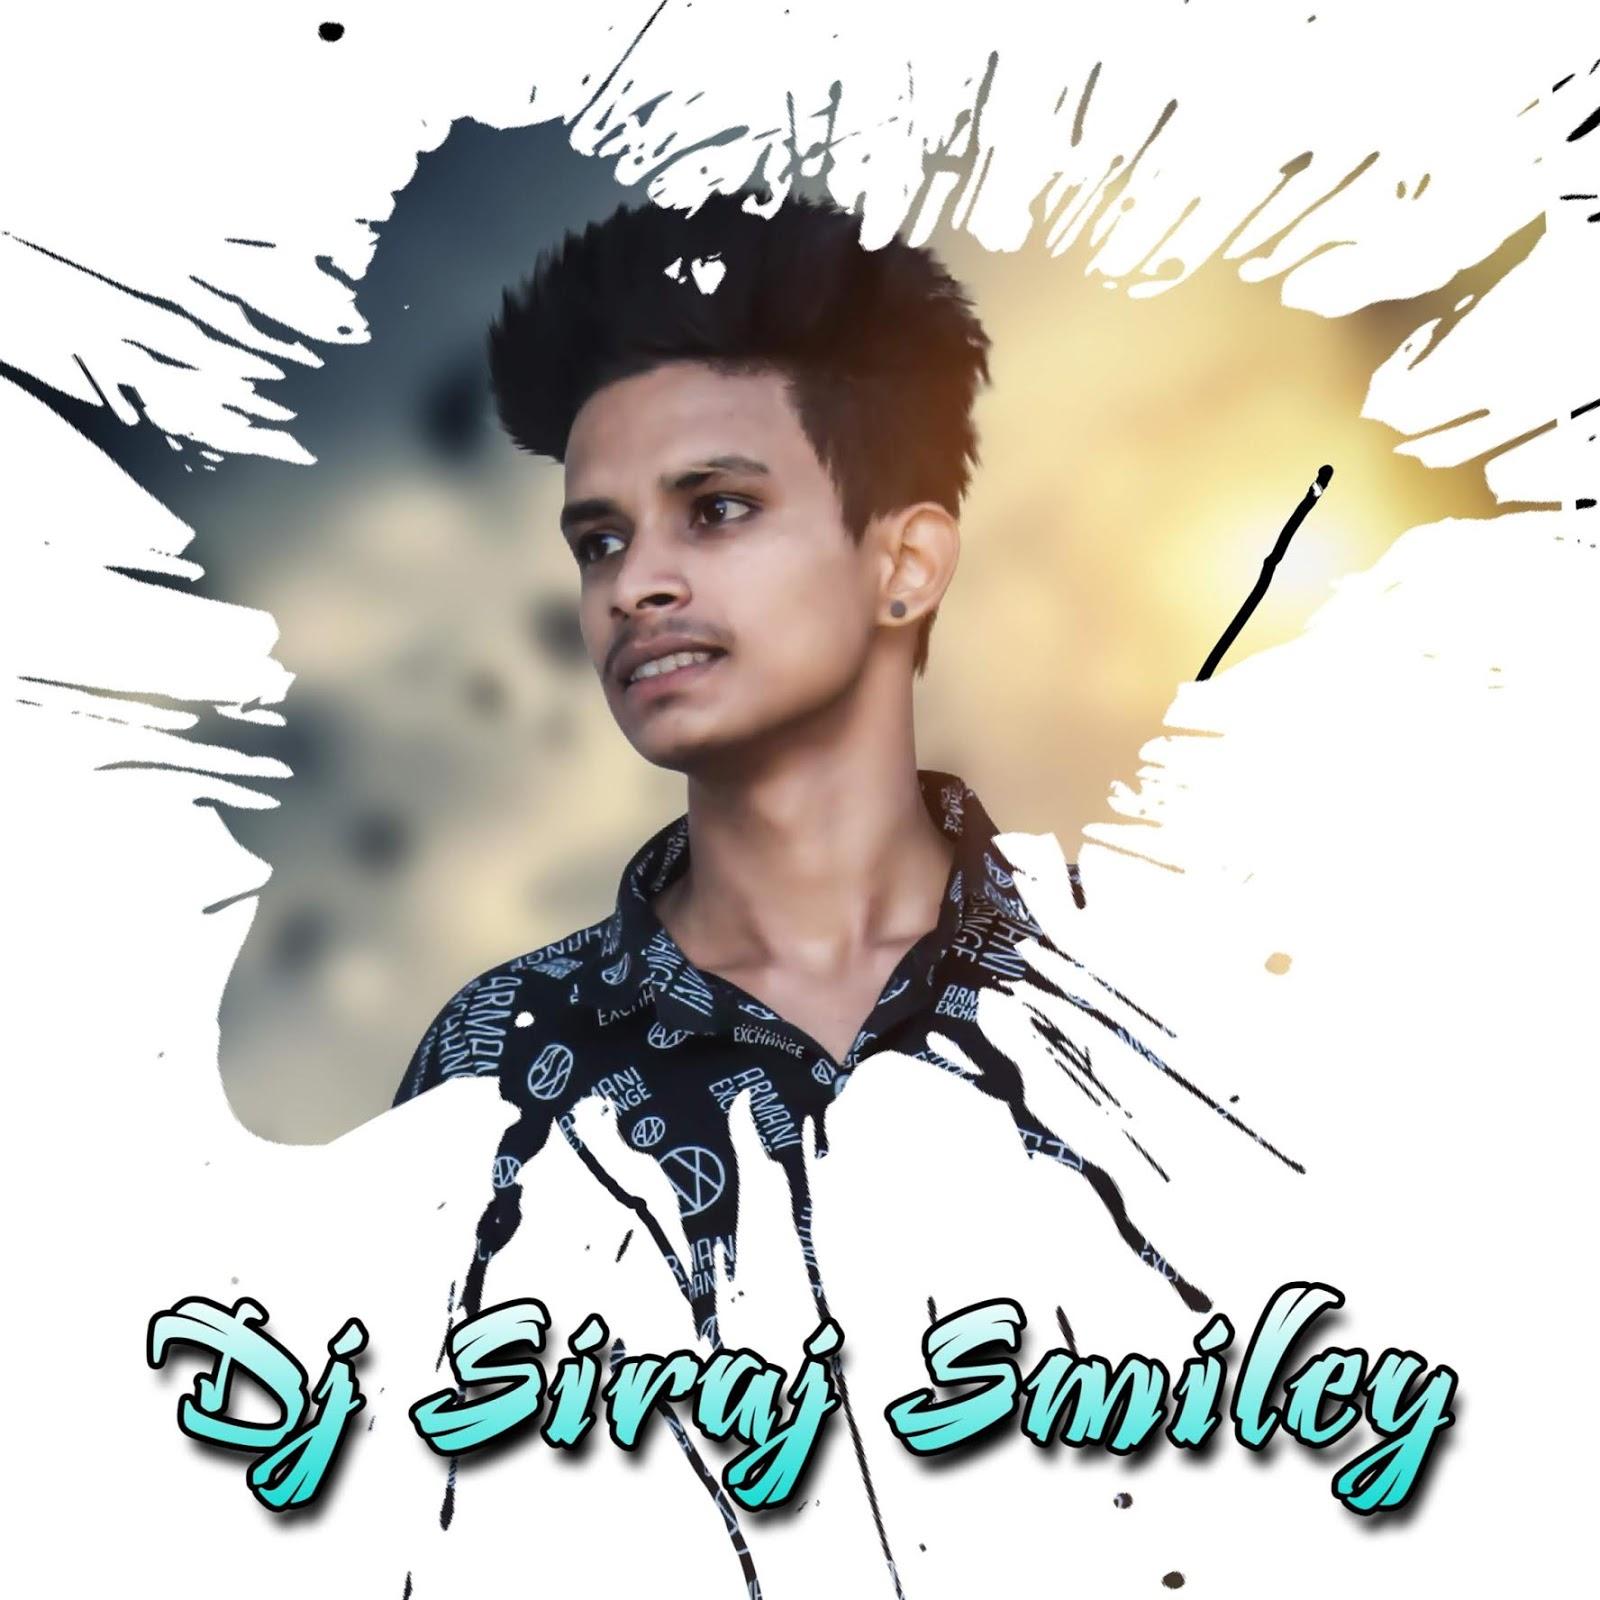 [Nayi Dhoro New folk song] -Dj Siraj Smiley Remix [NEWDJSWORLD.IN]